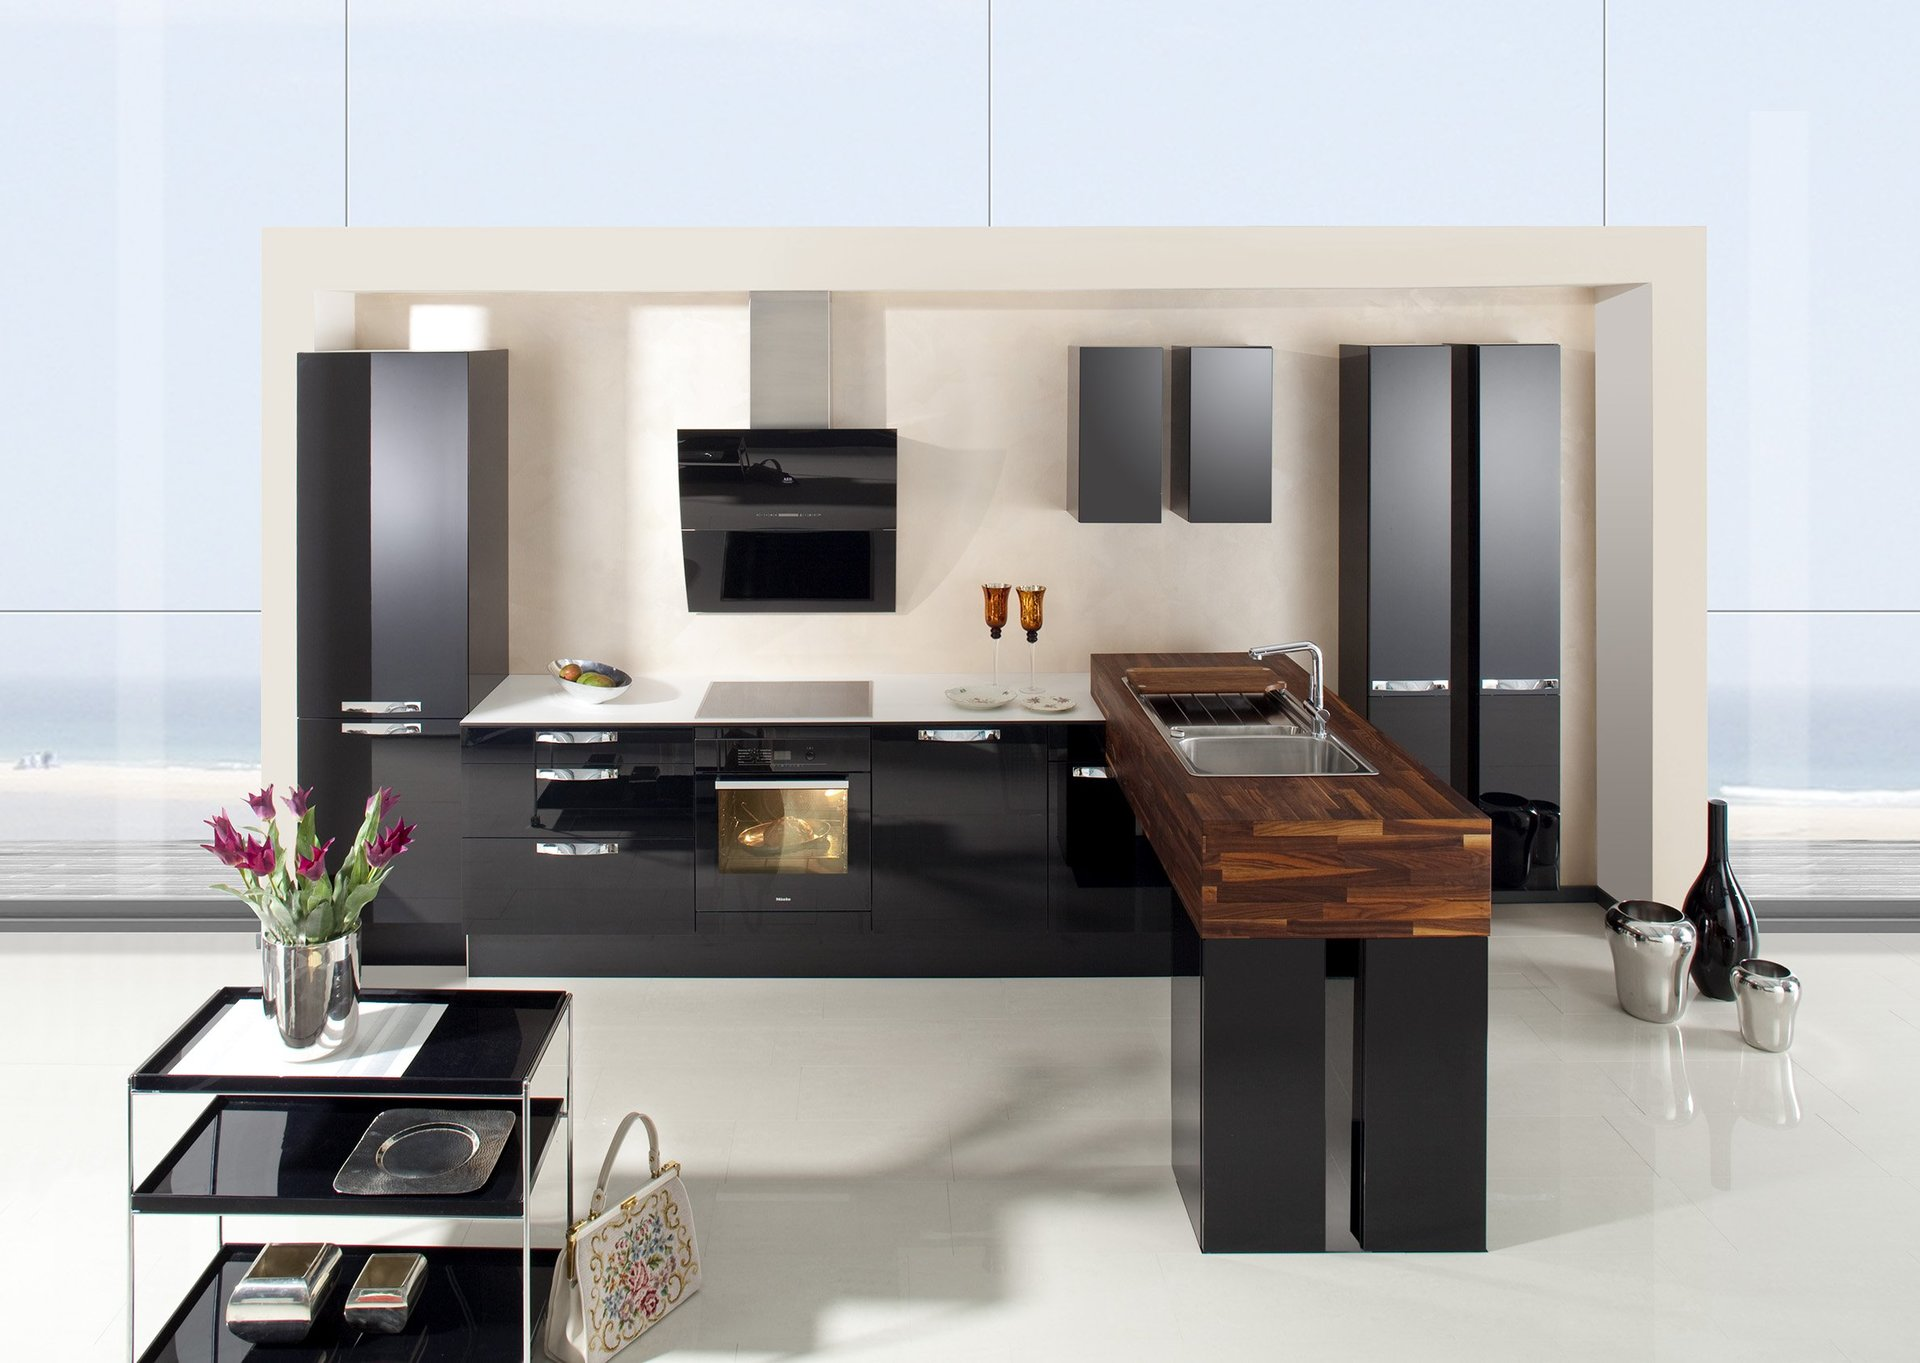 Rempp uk bespoke top range german kitchens for Best german kitchen cabinets